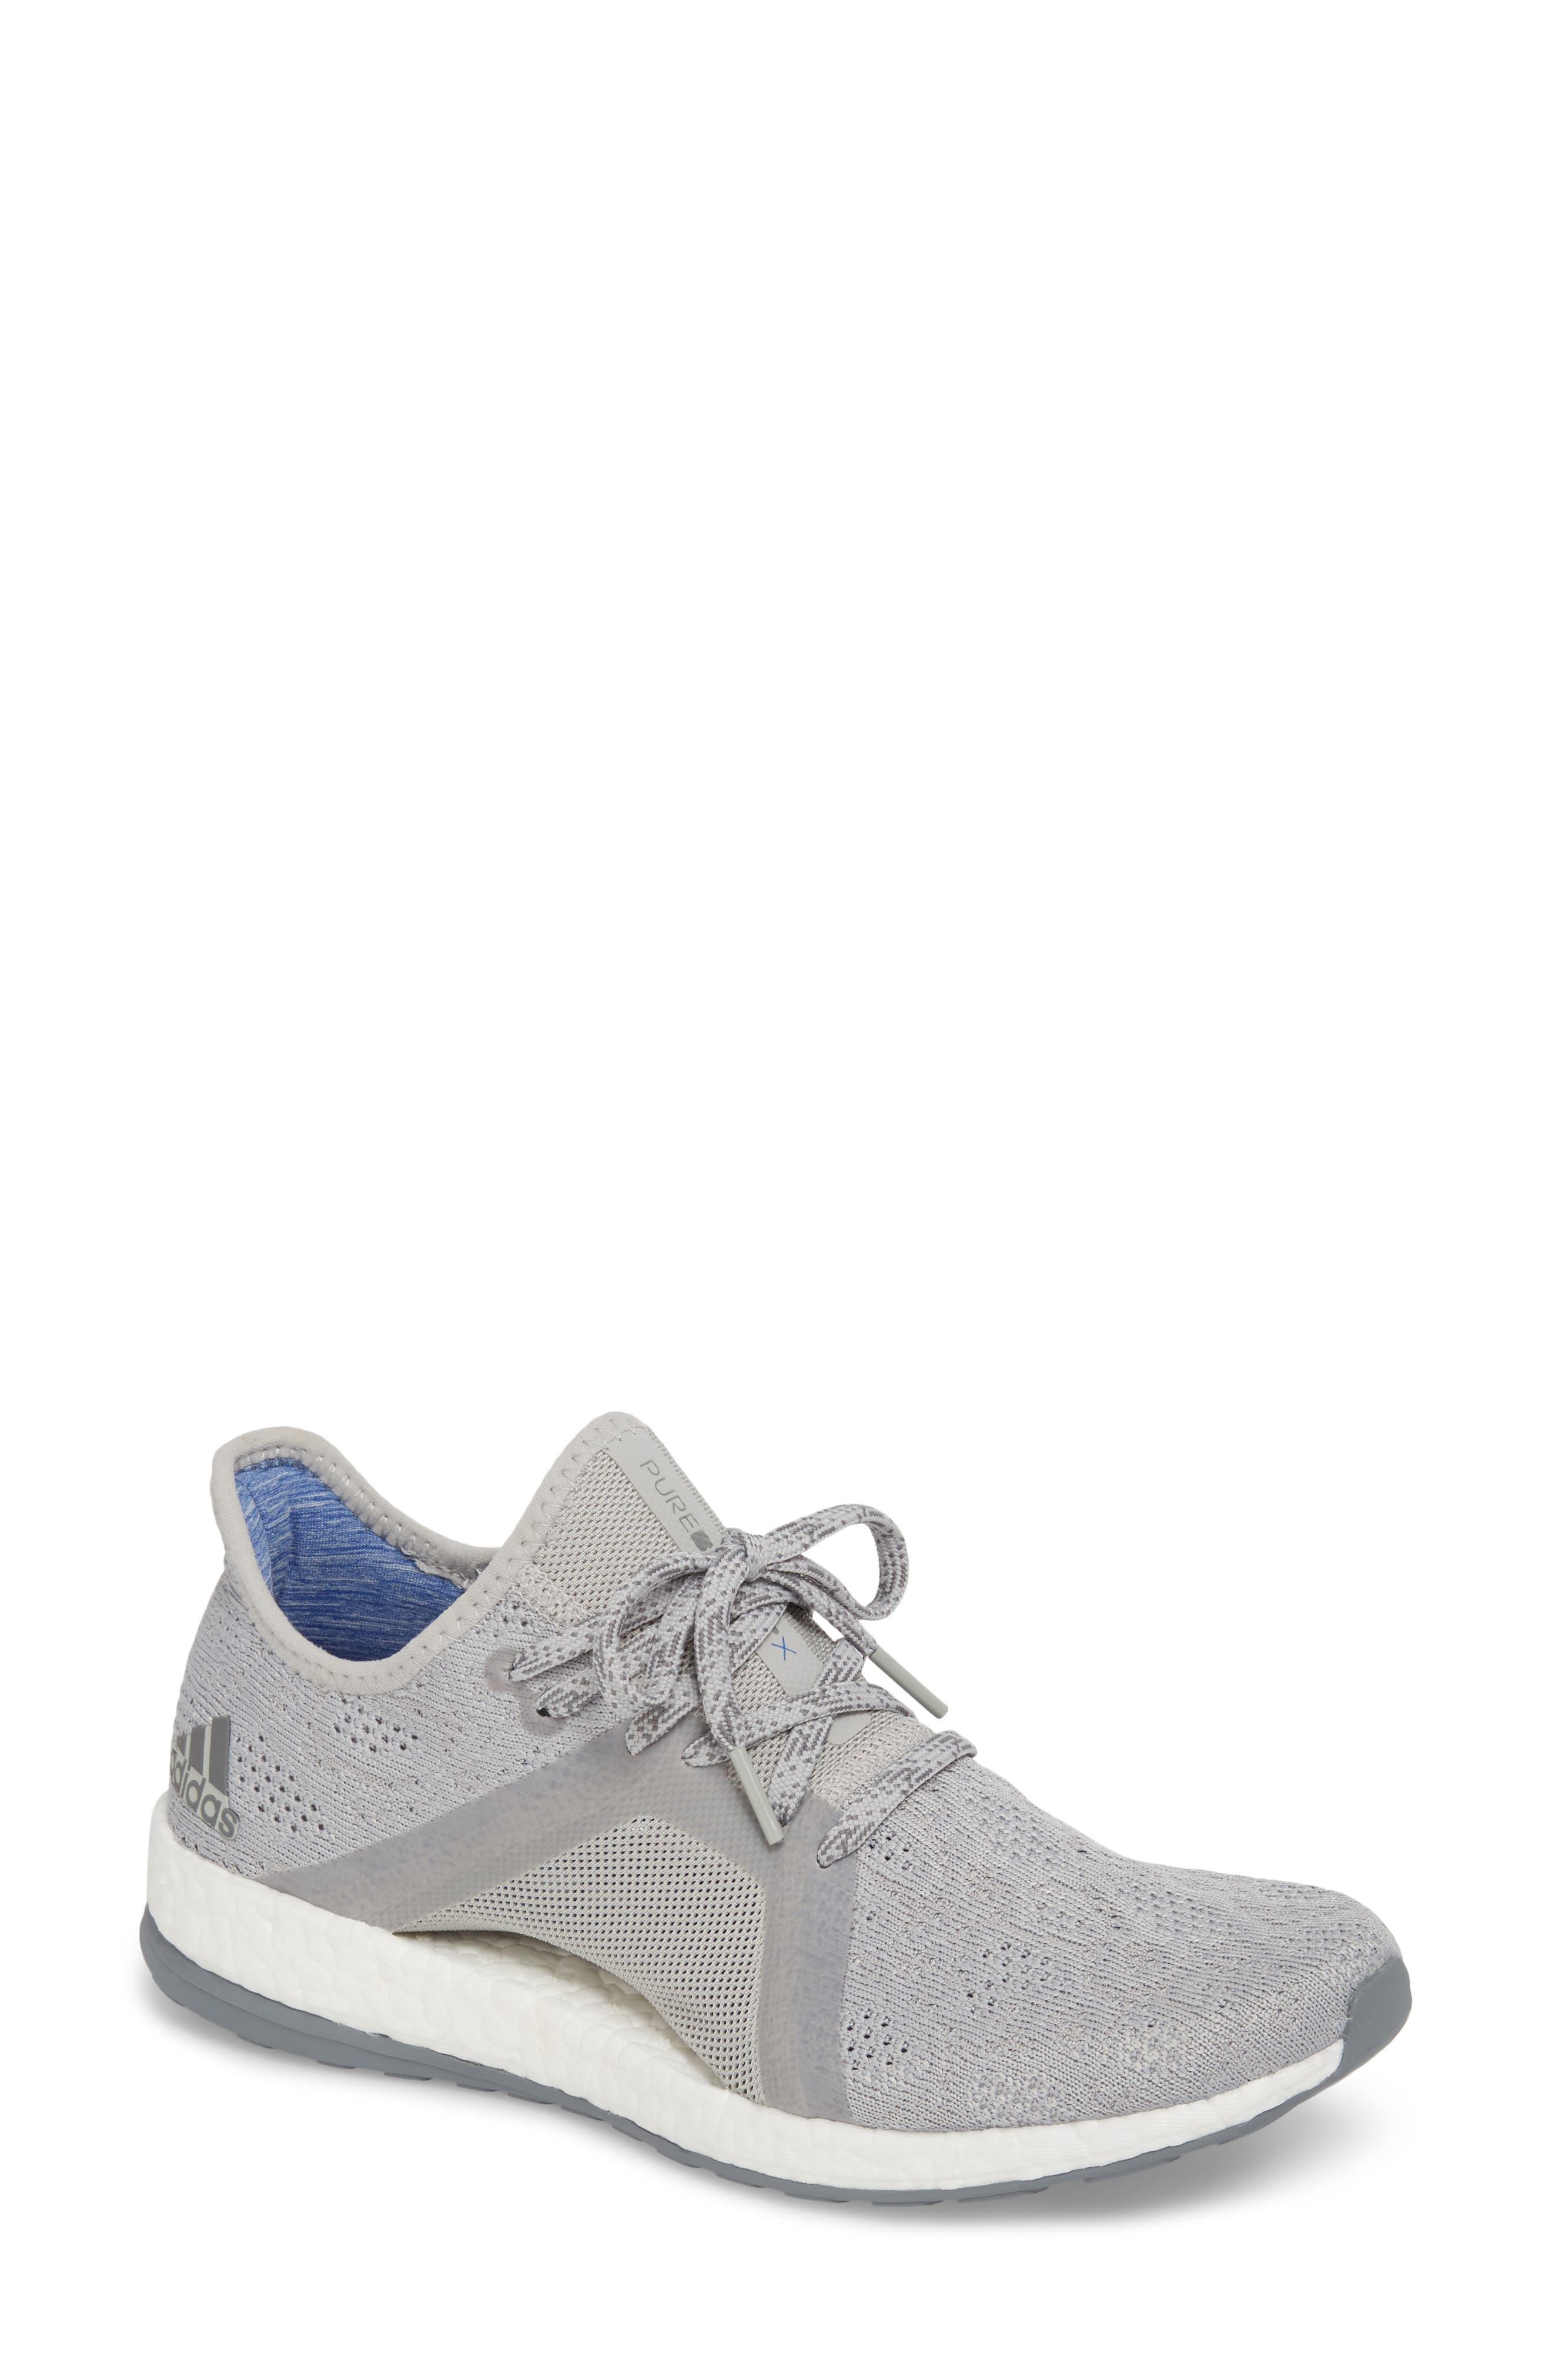 adidas PureBoost X Element Knit Running Shoe Women